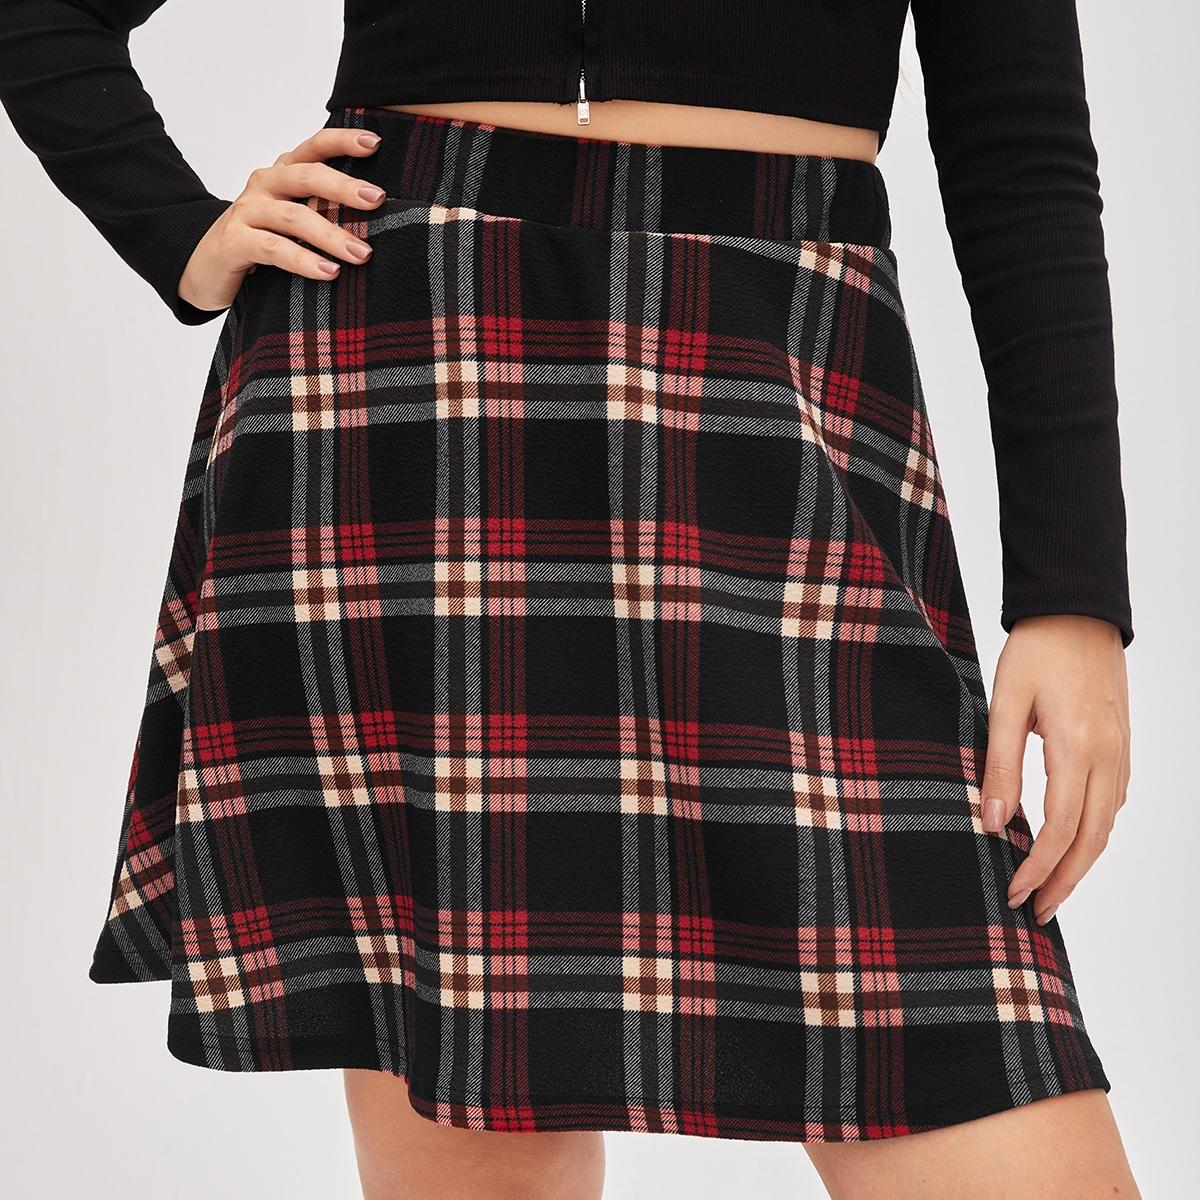 SHEIN / Plus Tartan Flared Skirt